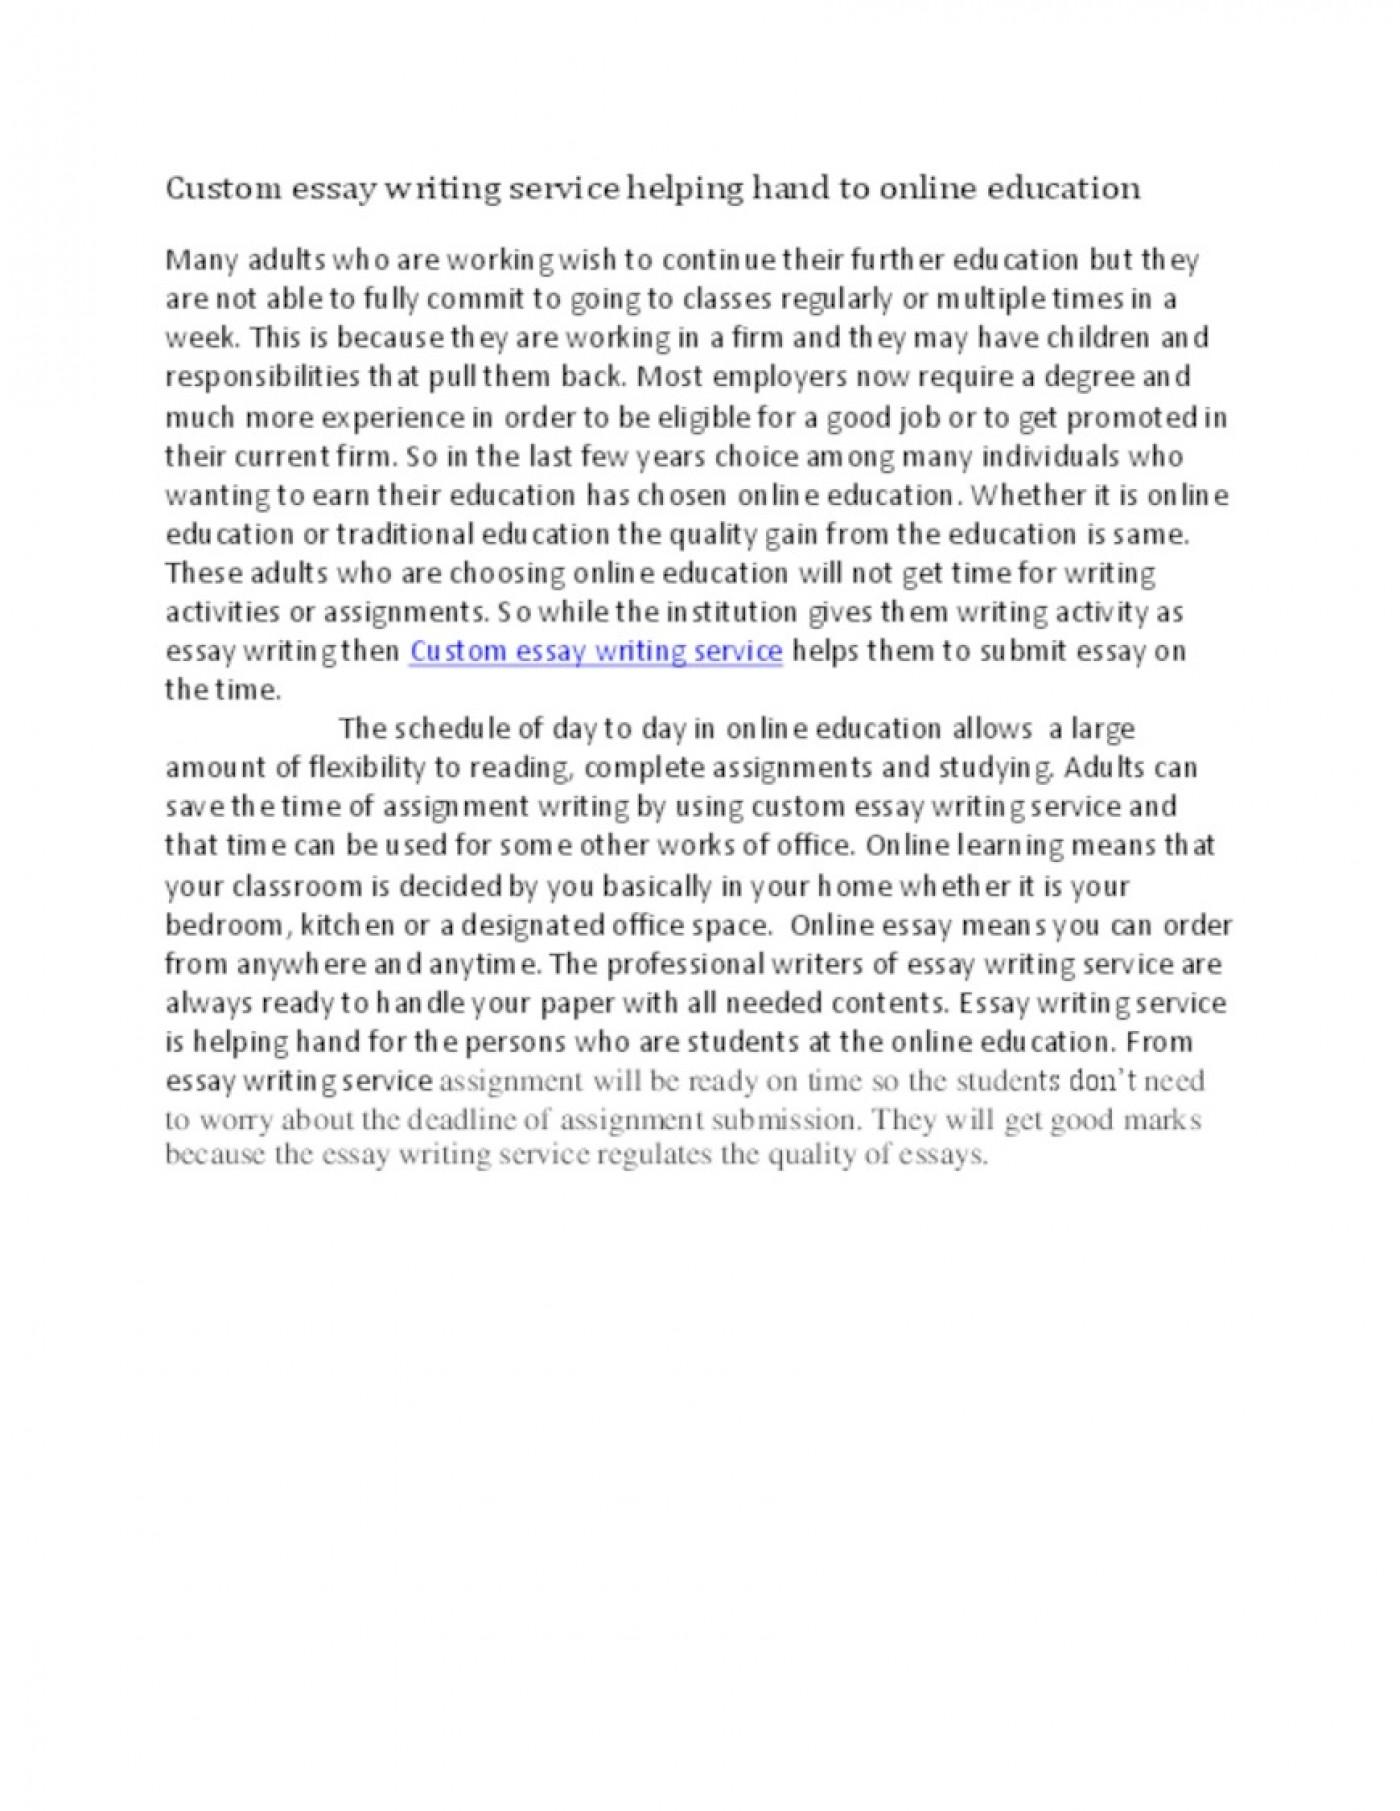 Buy an Essay in 35+ Subjects